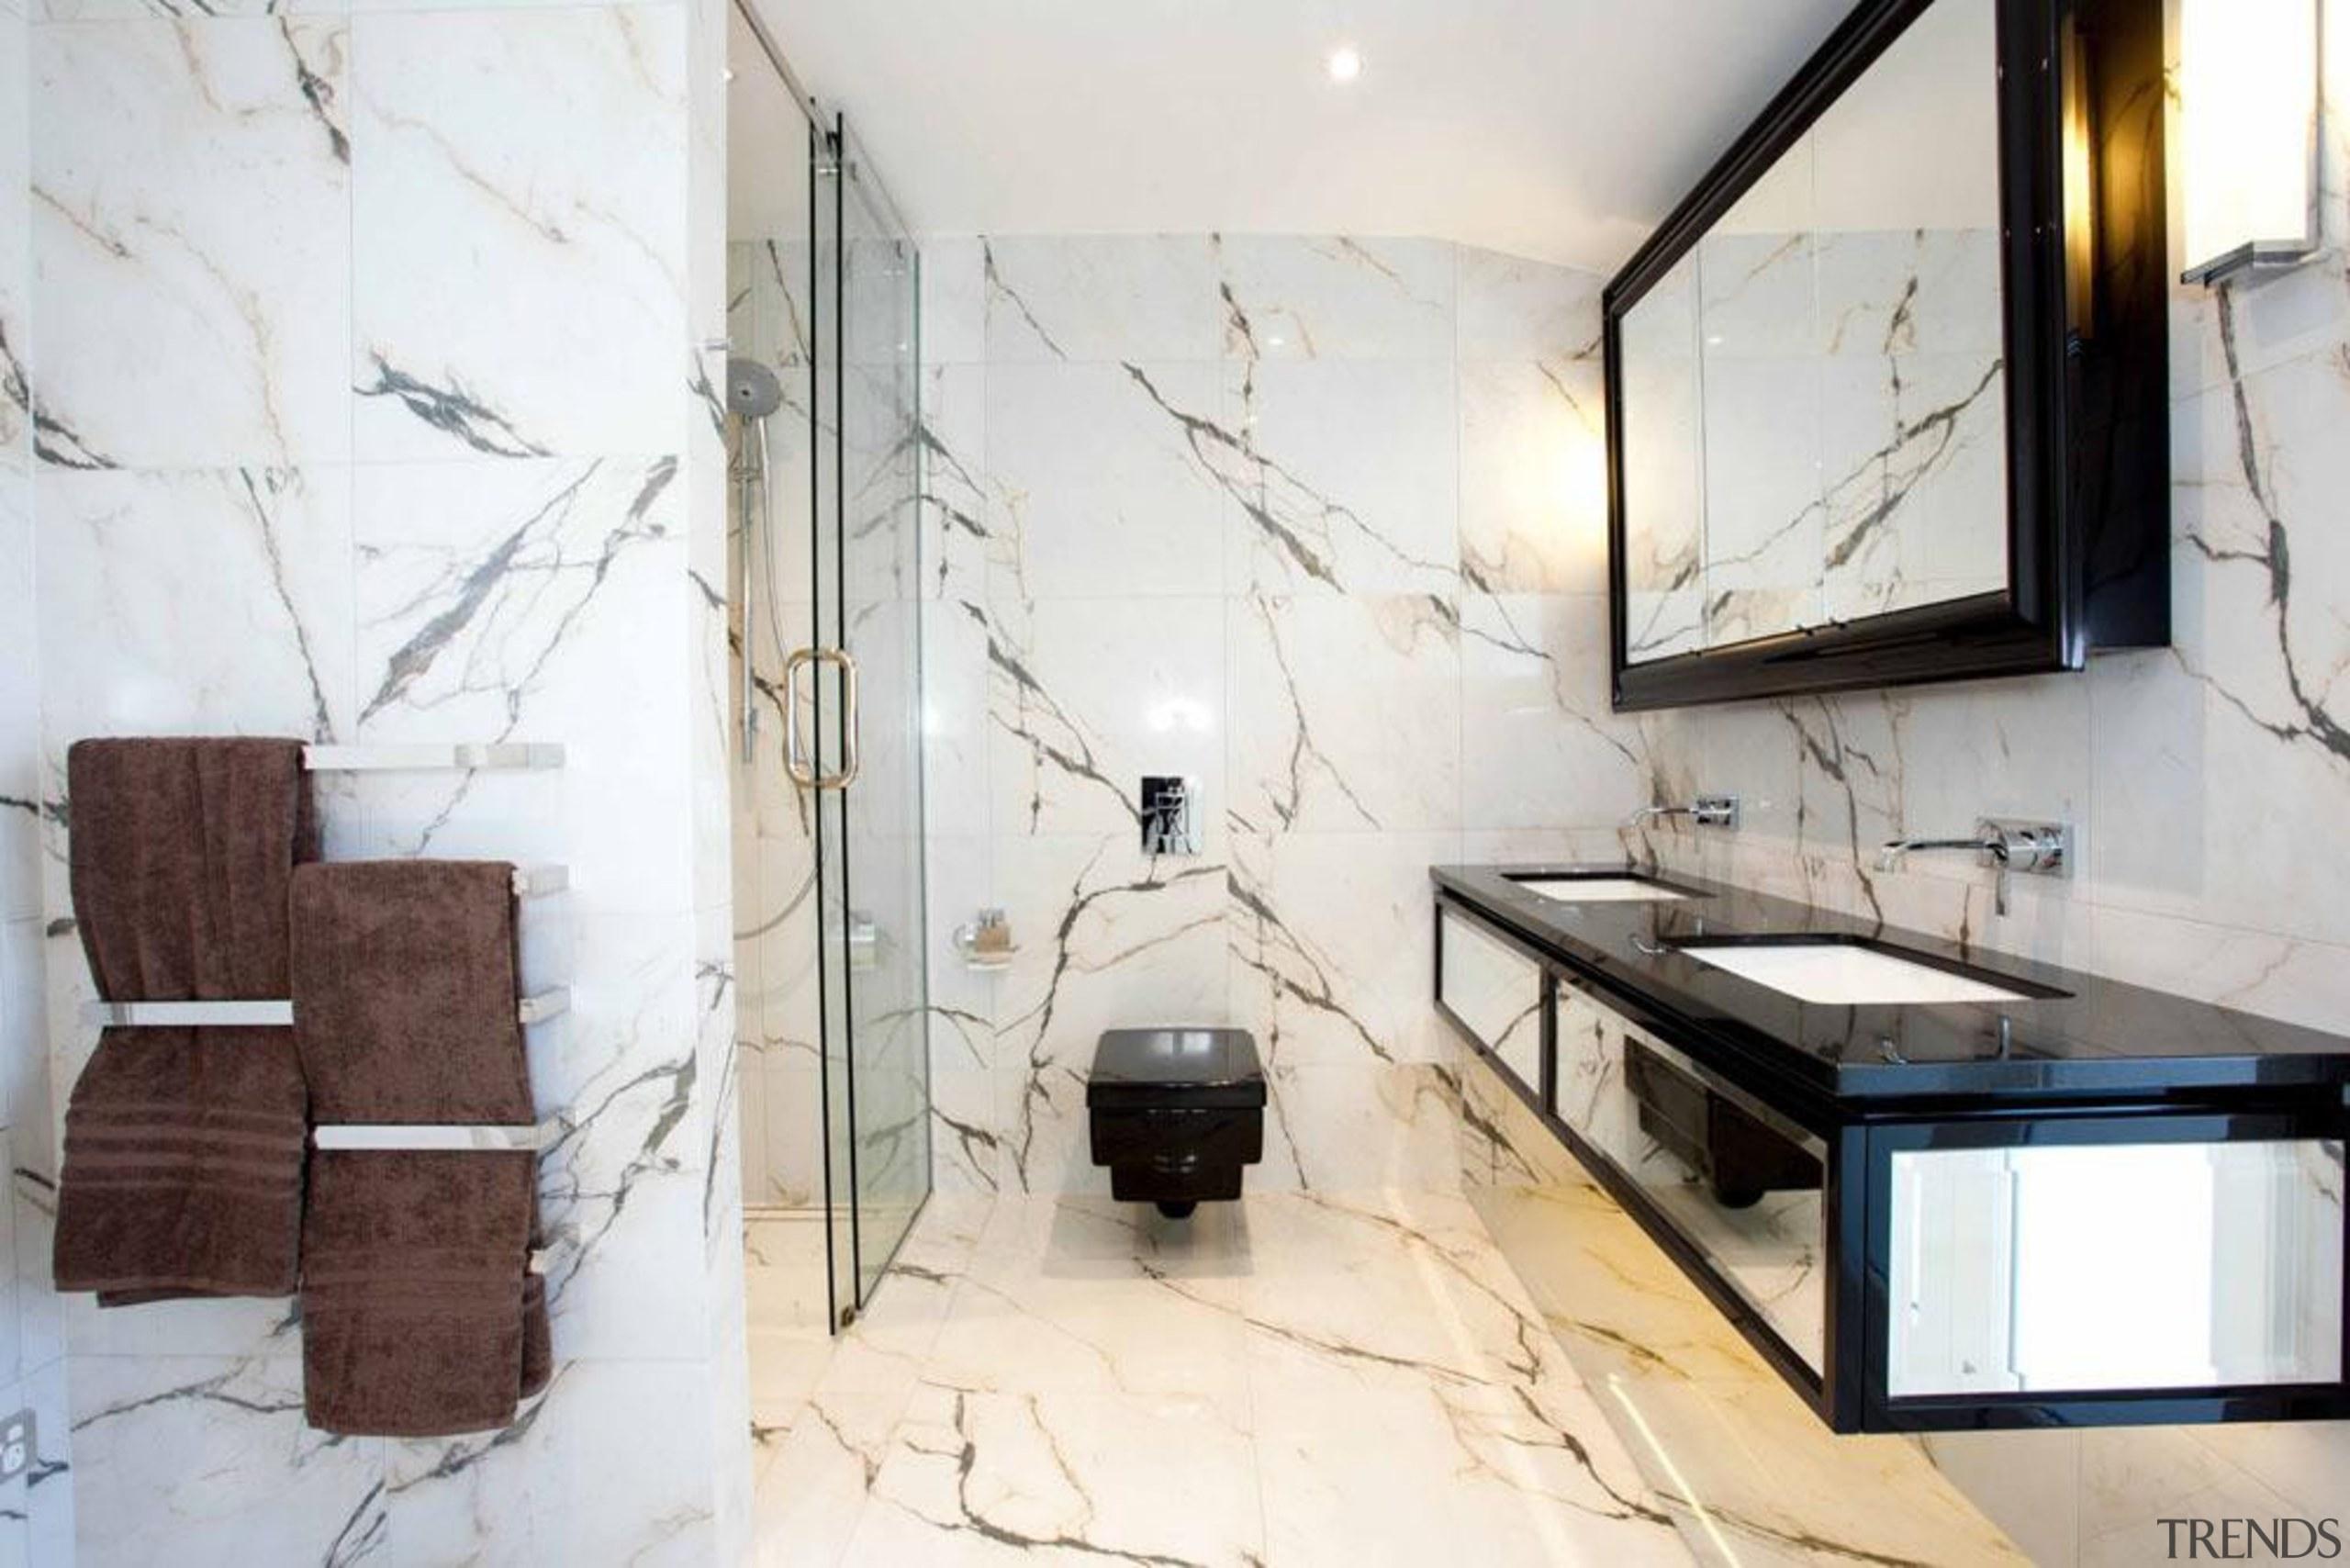 1.jpg - floor | home | interior design floor, home, interior design, property, room, wall, white